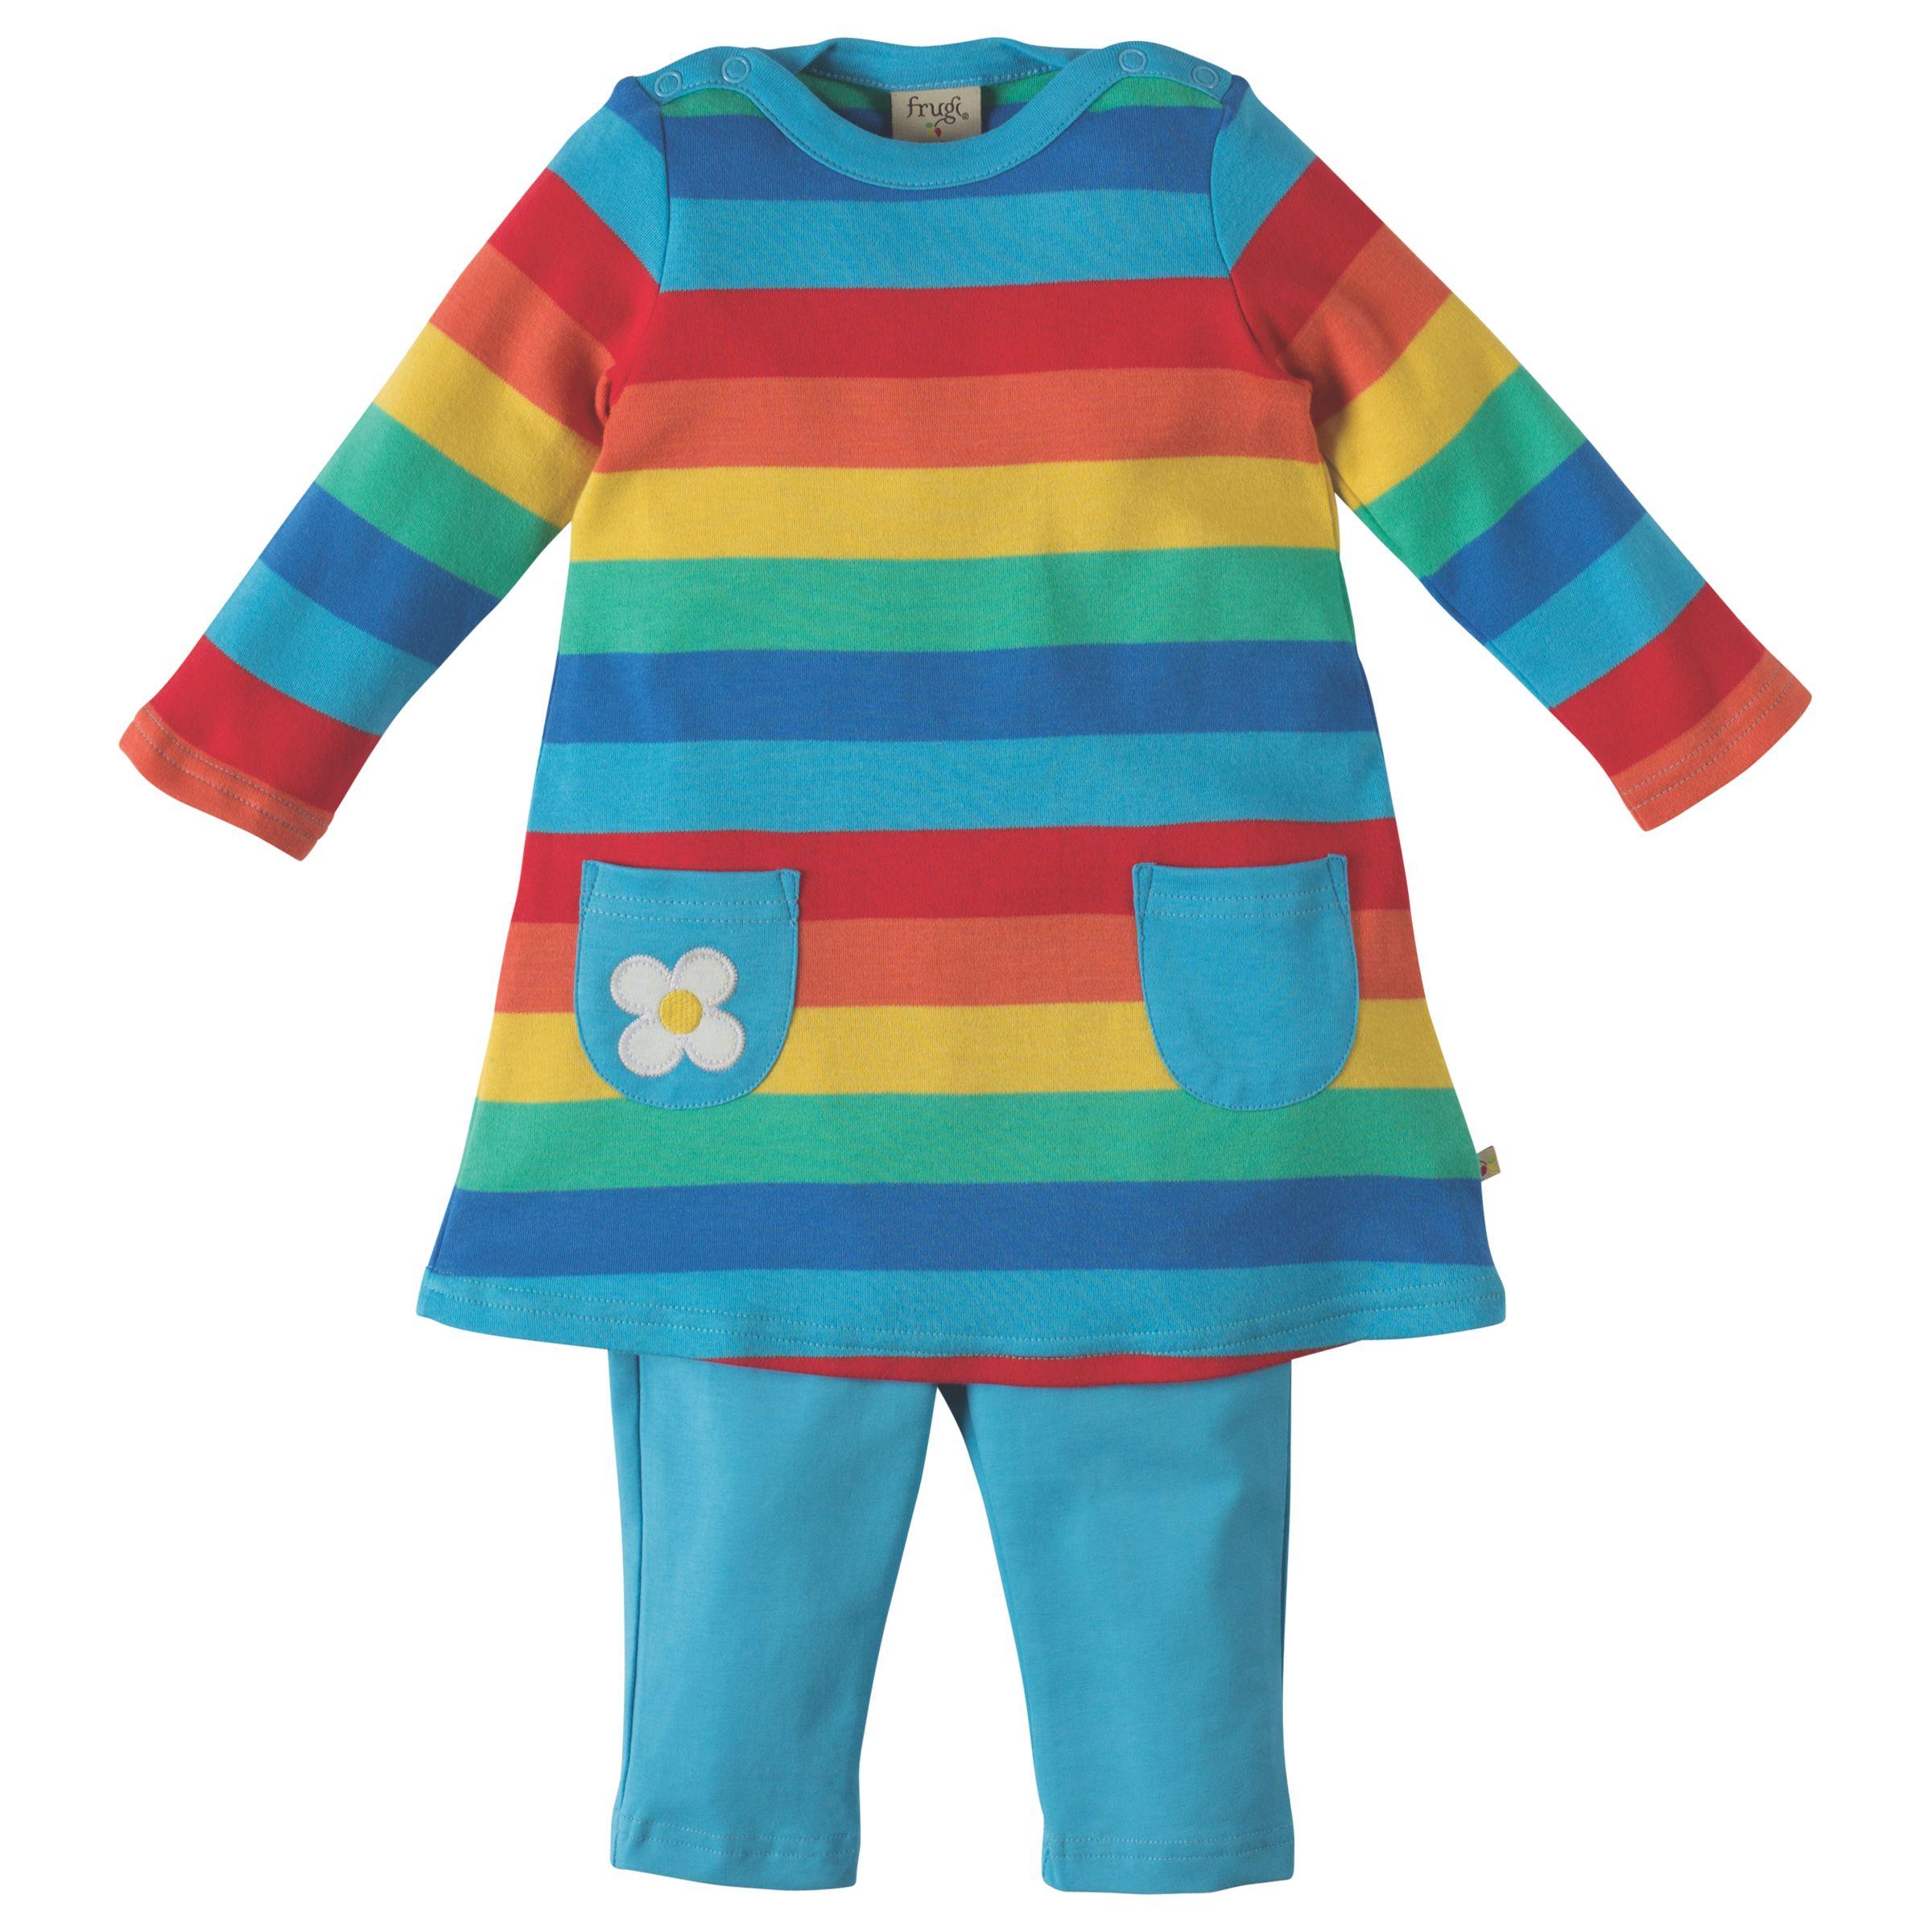 Frugi Organic Frugi Organic Baby Rainbow Tunic Top and Leggings Set, Multi